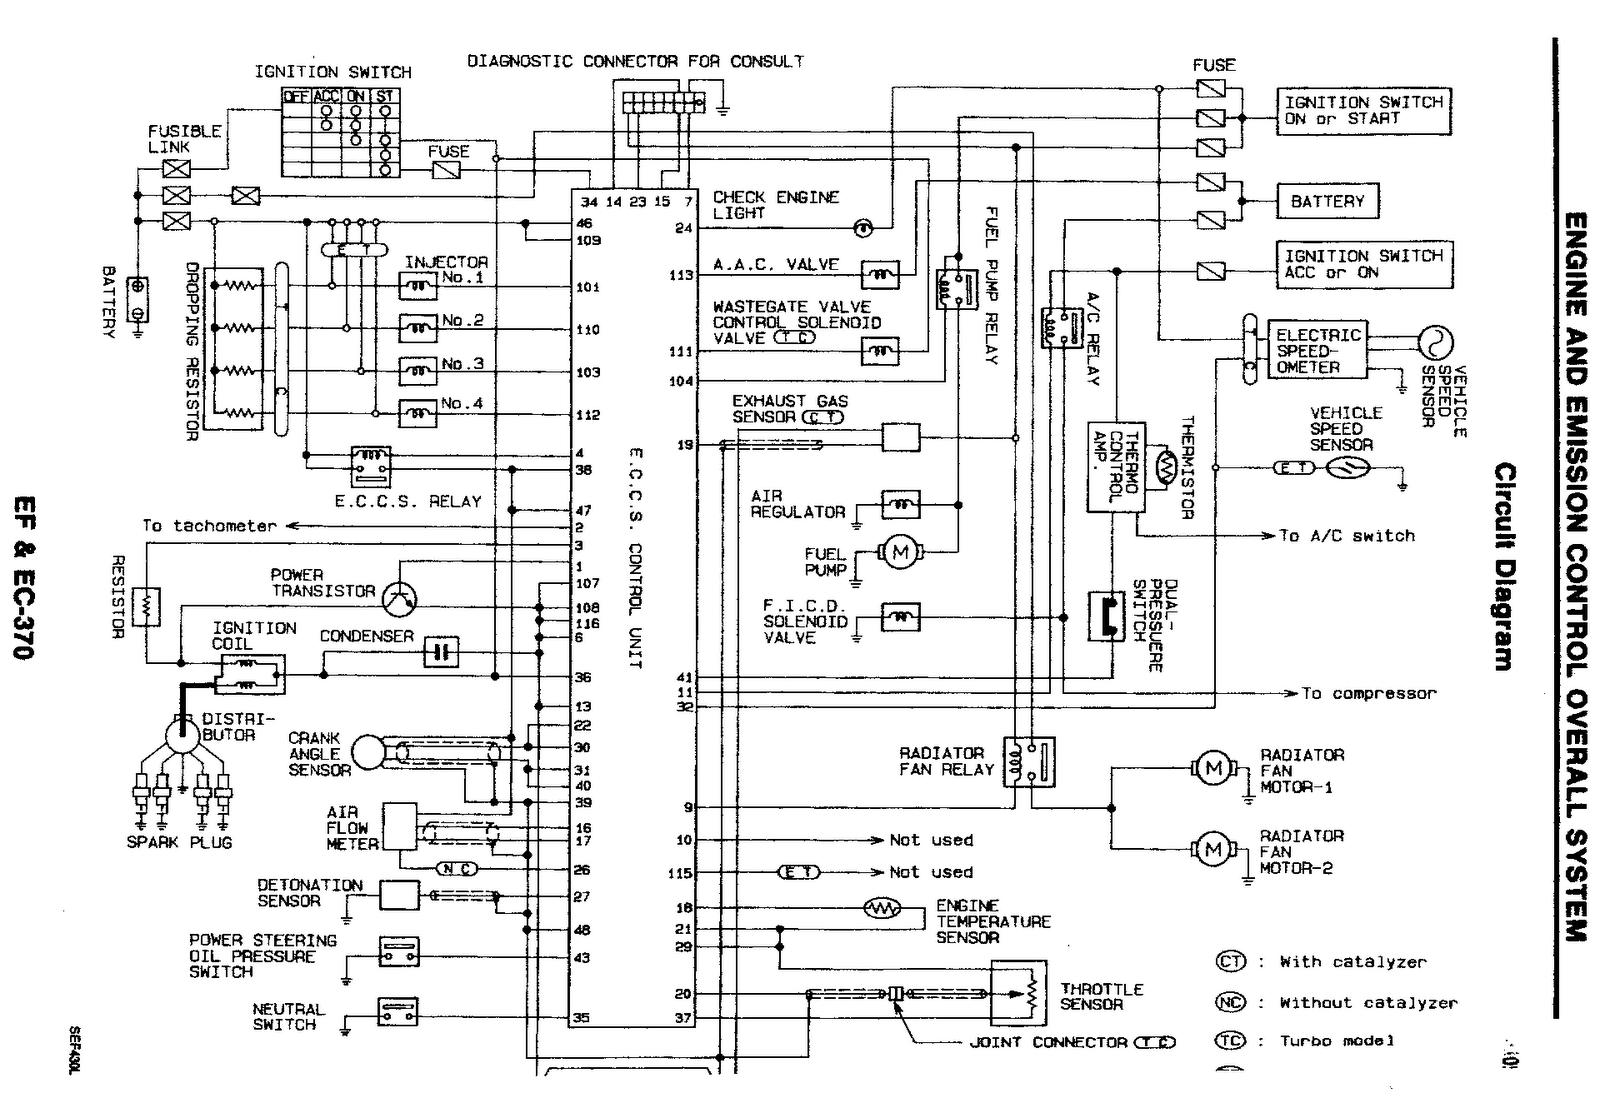 2003 Mitsubishi Montero Sport Radio Wiring Diagram